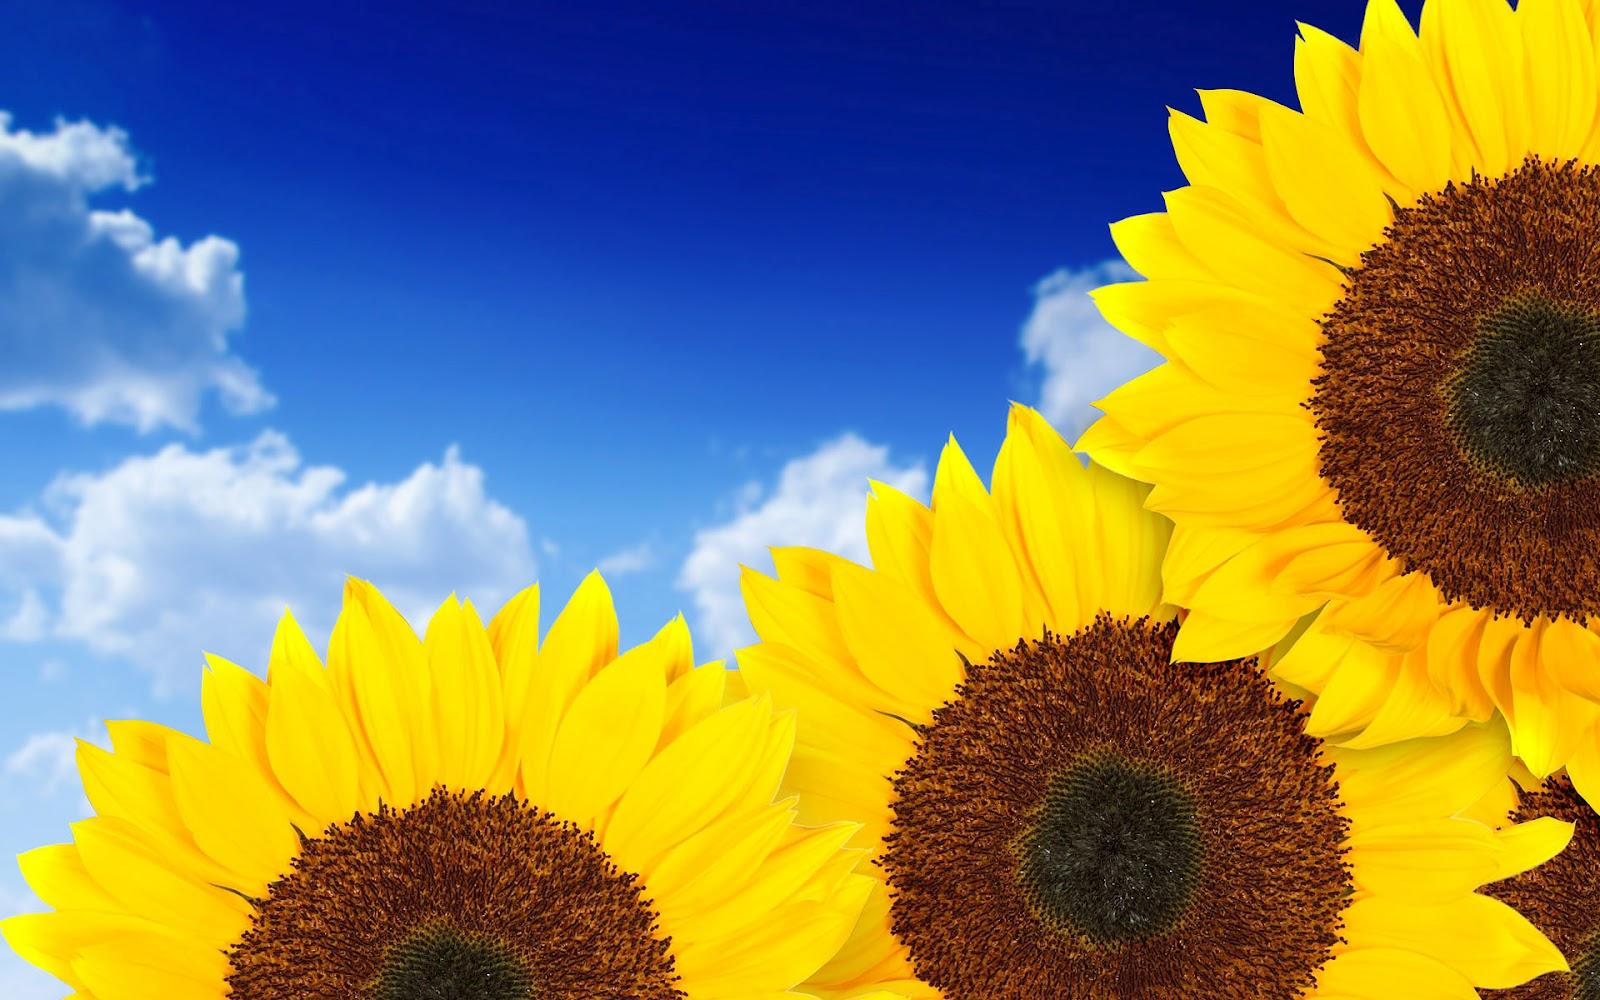 summer sunflowers andrea - photo #46